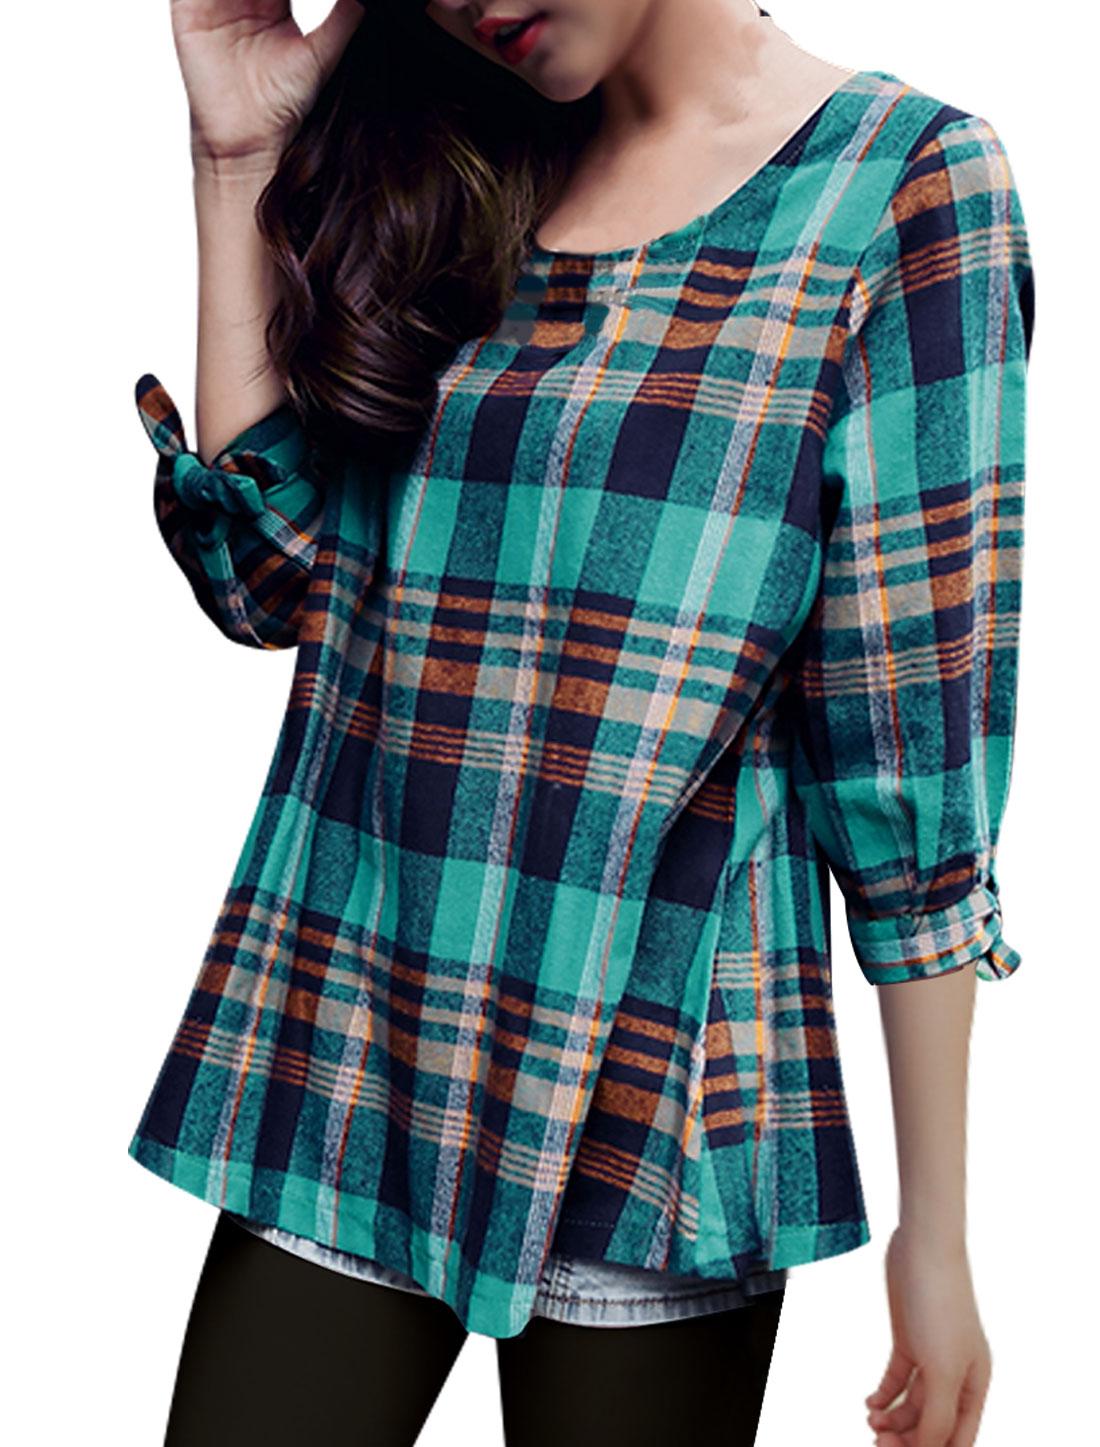 Ladies Round Neck 3/4 Sleeve Green Navy Plaids Top Shirt XS